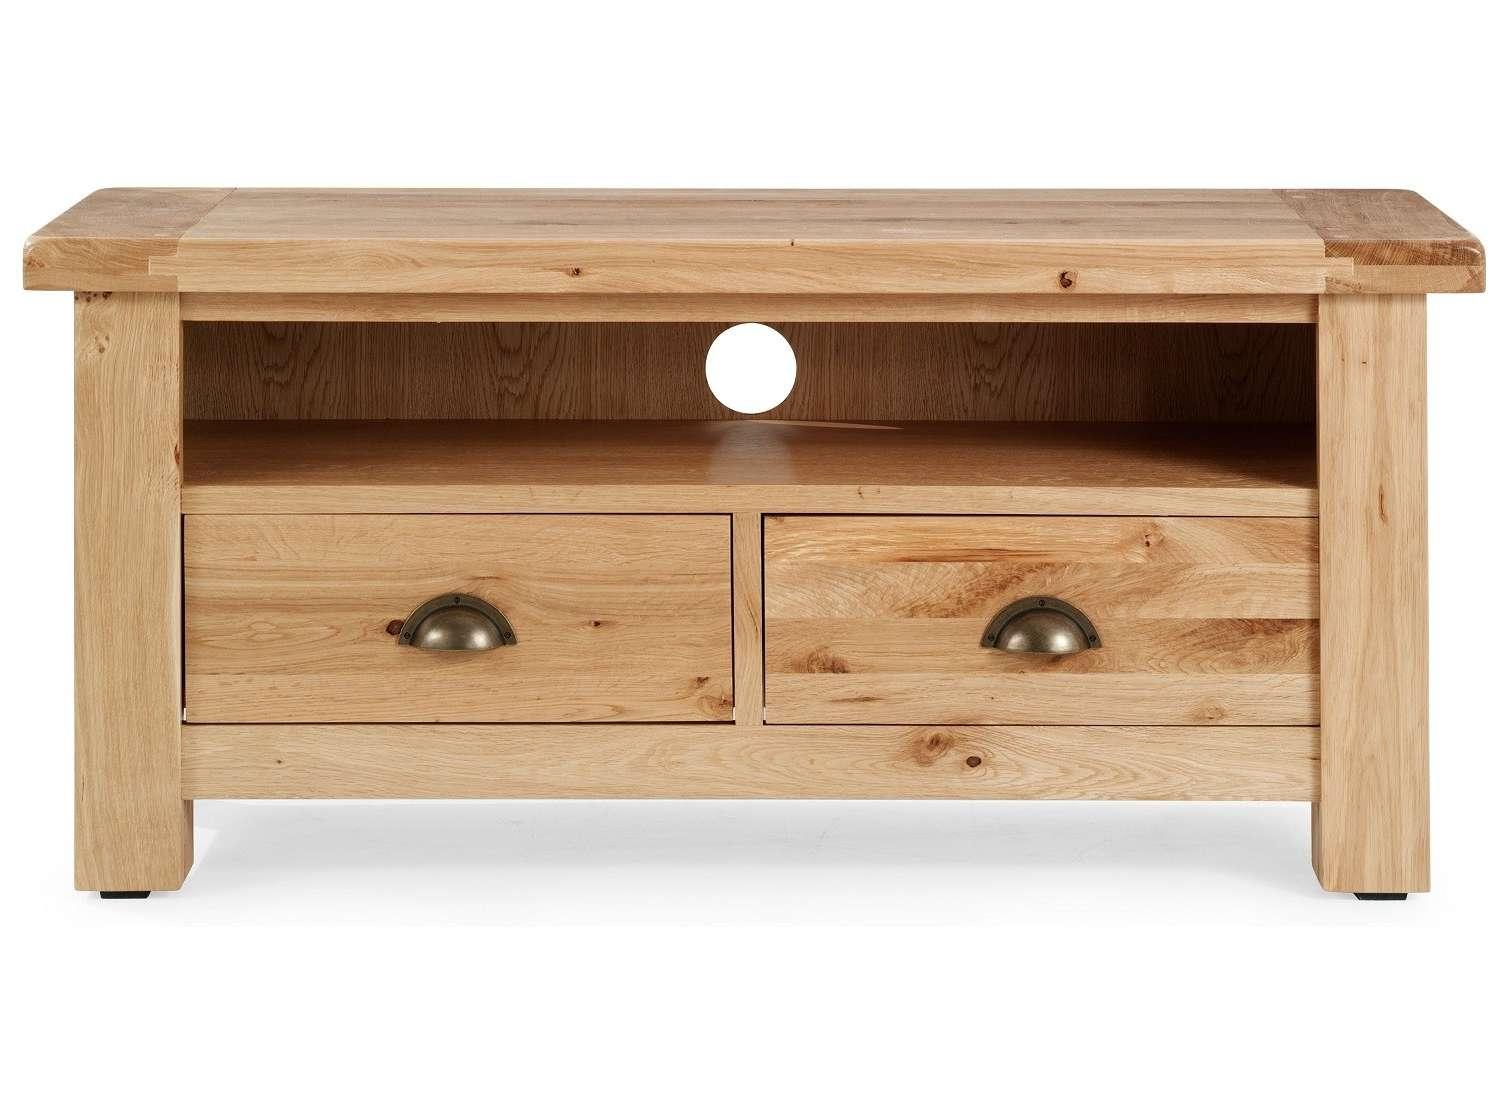 Normandy Rustic French Oak Tv Cabinet | Oak Furniture Uk Regarding Oak Tv Cabinets (View 9 of 20)